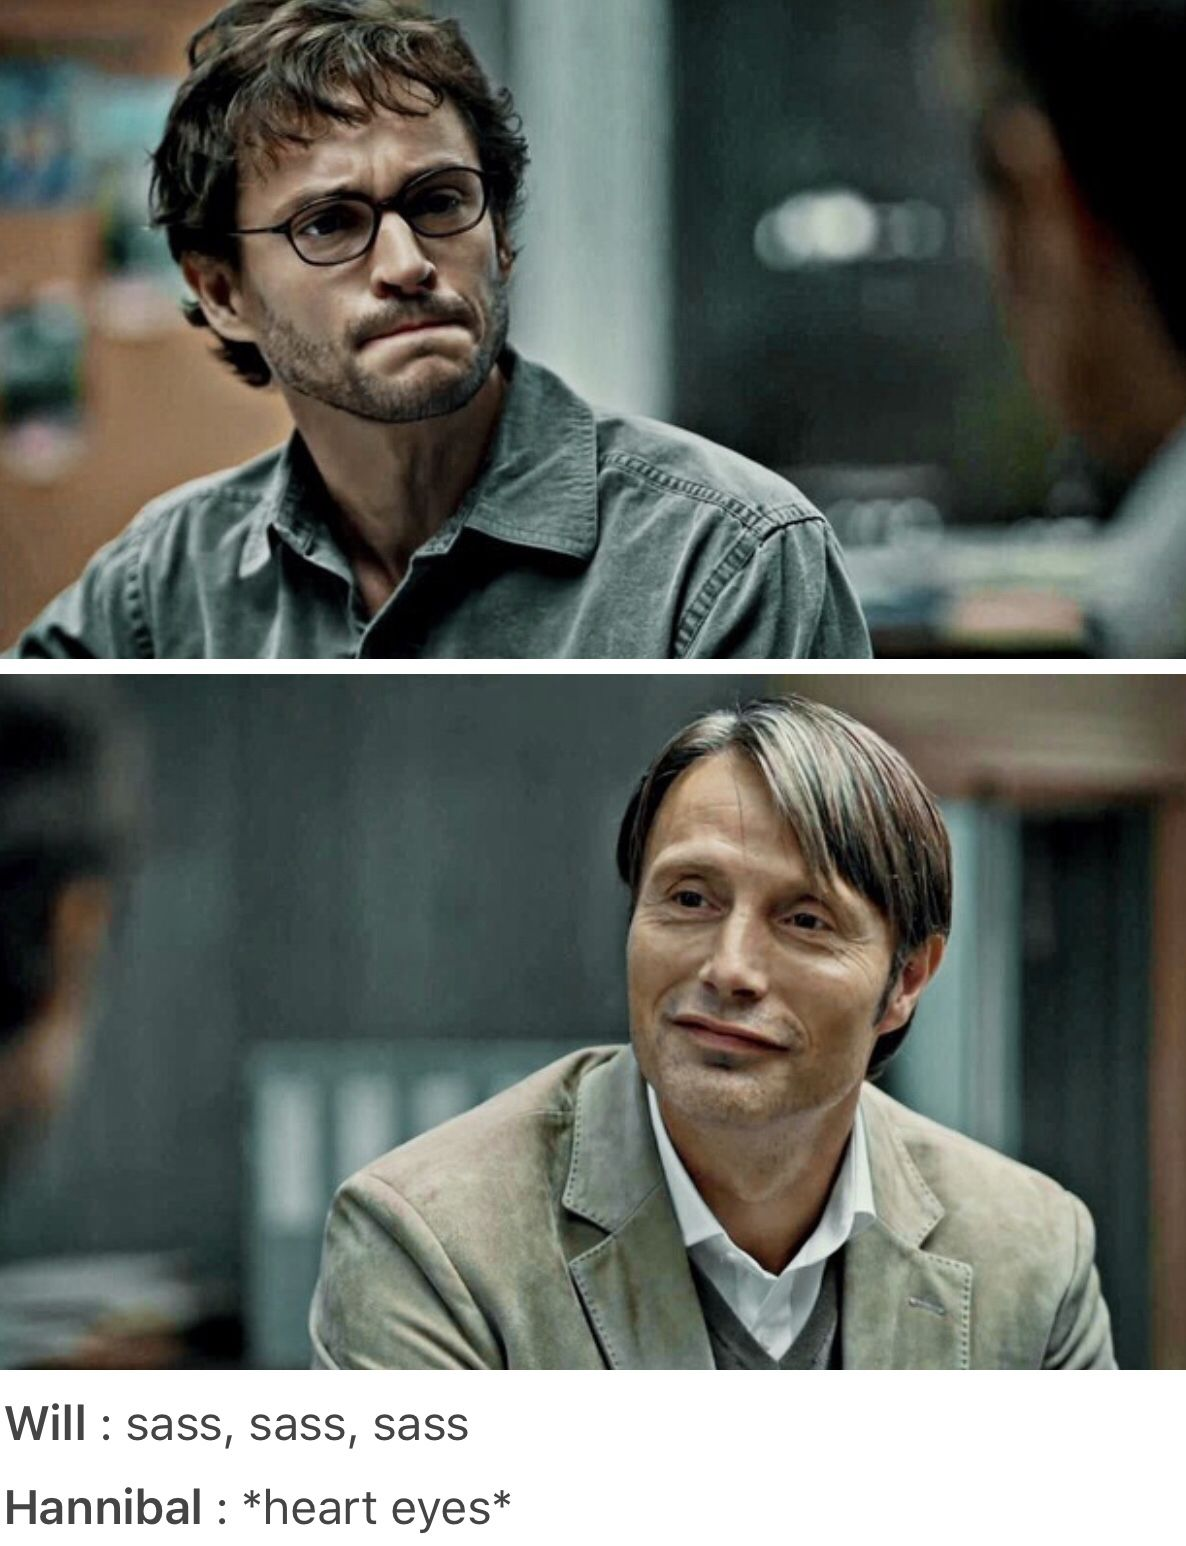 Hannibal meme image by misumena on Hannibal Hannibal